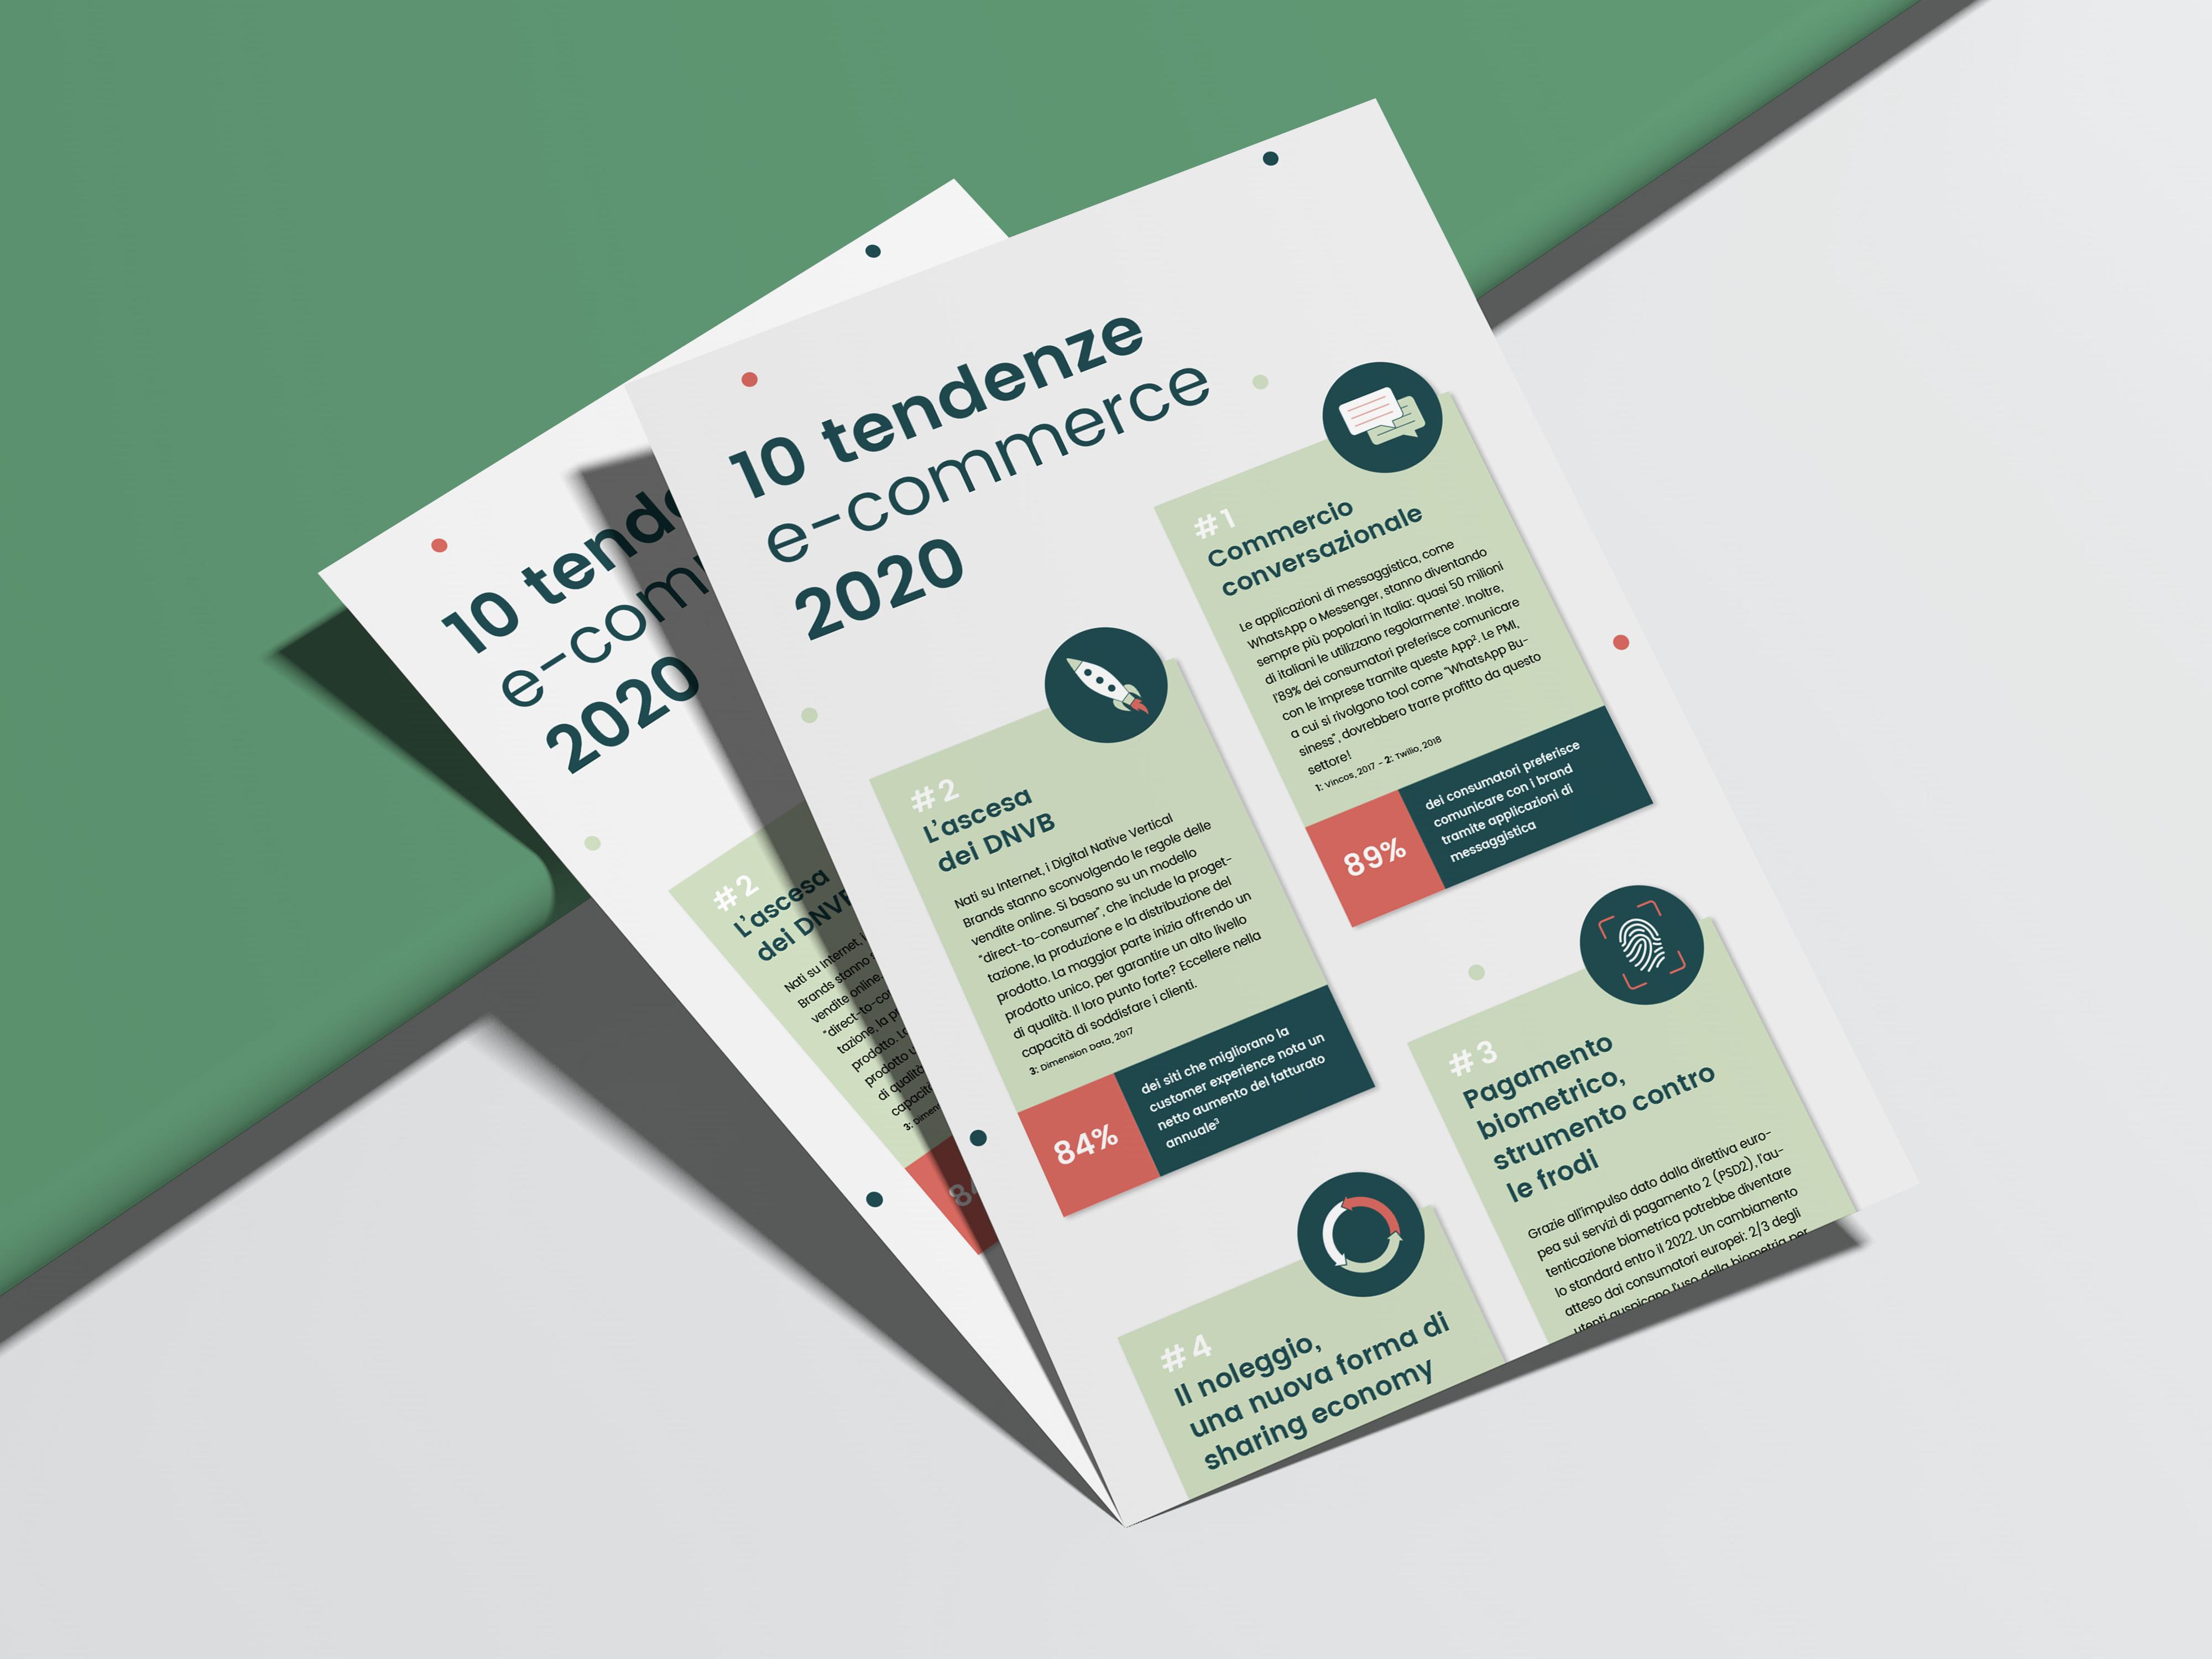 IT_MockUP_Infographie_10 tendenze e-commerce 2020